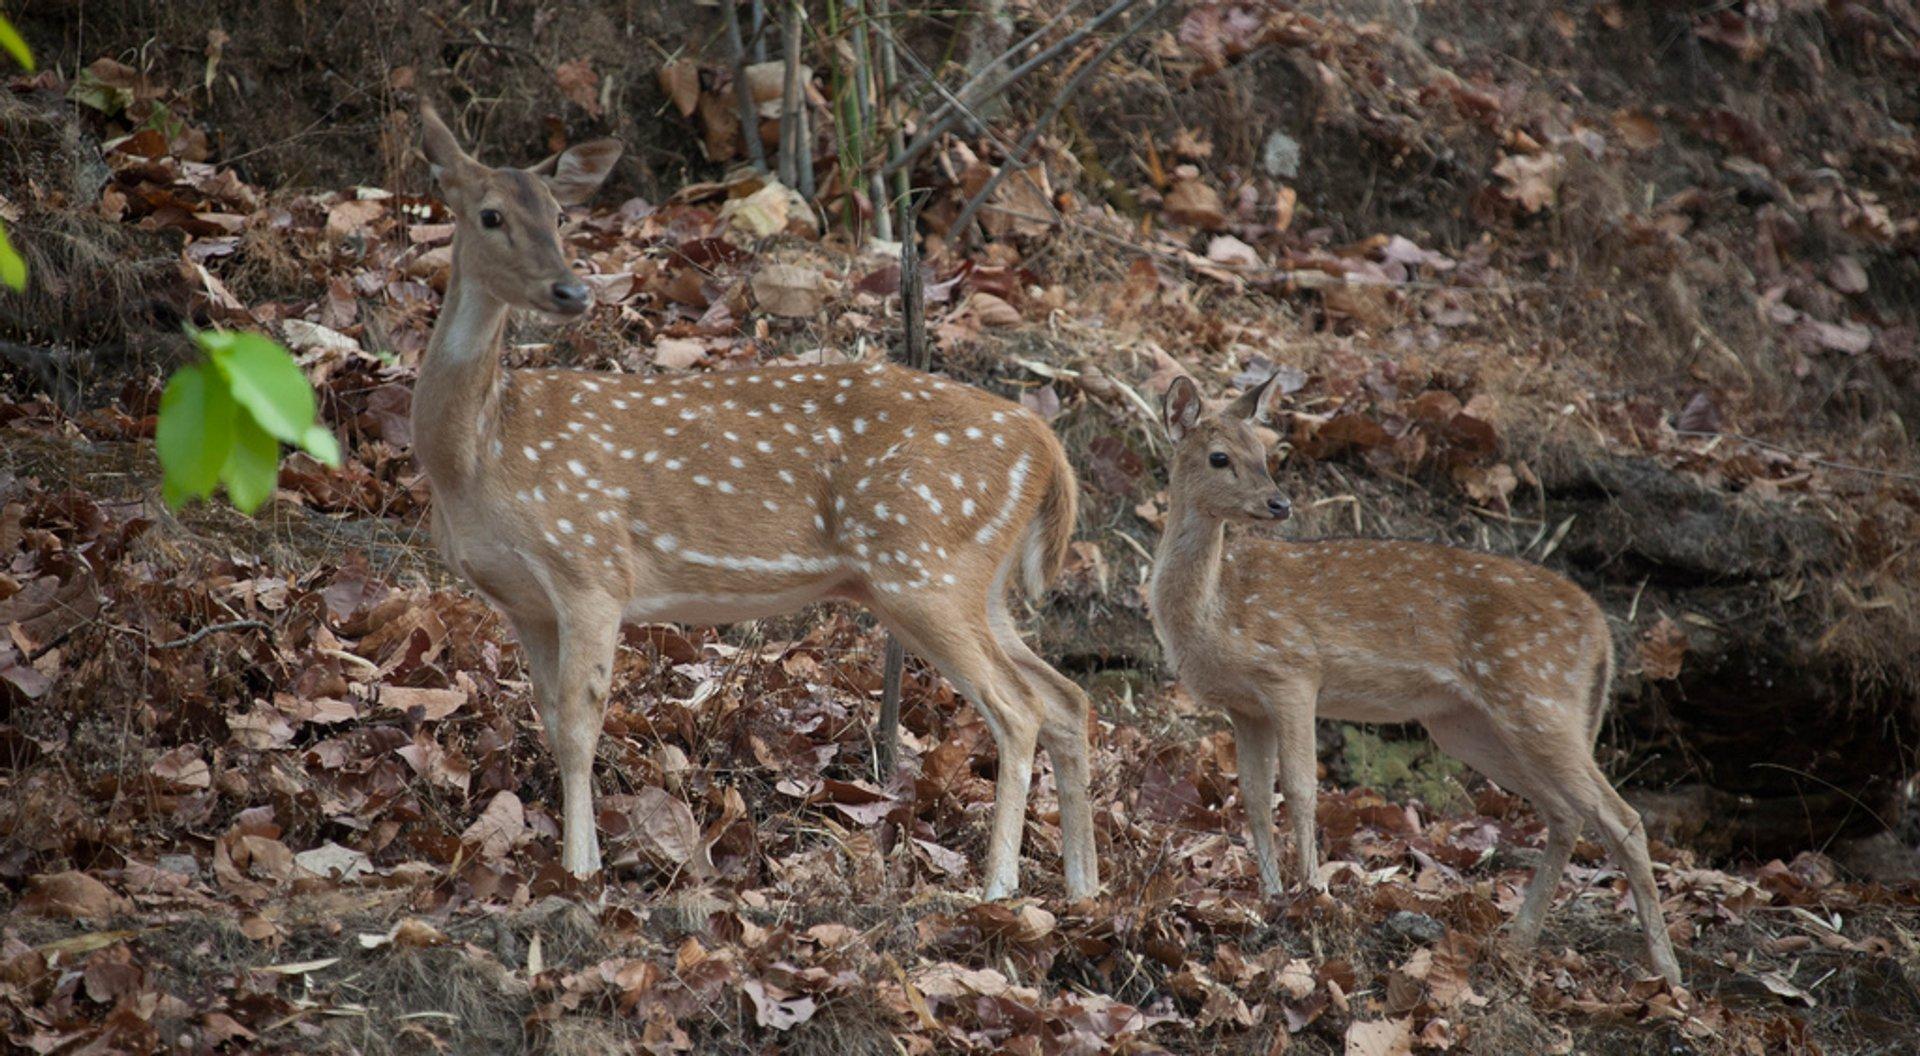 Deer in the Bandhavgarh National Park 2020